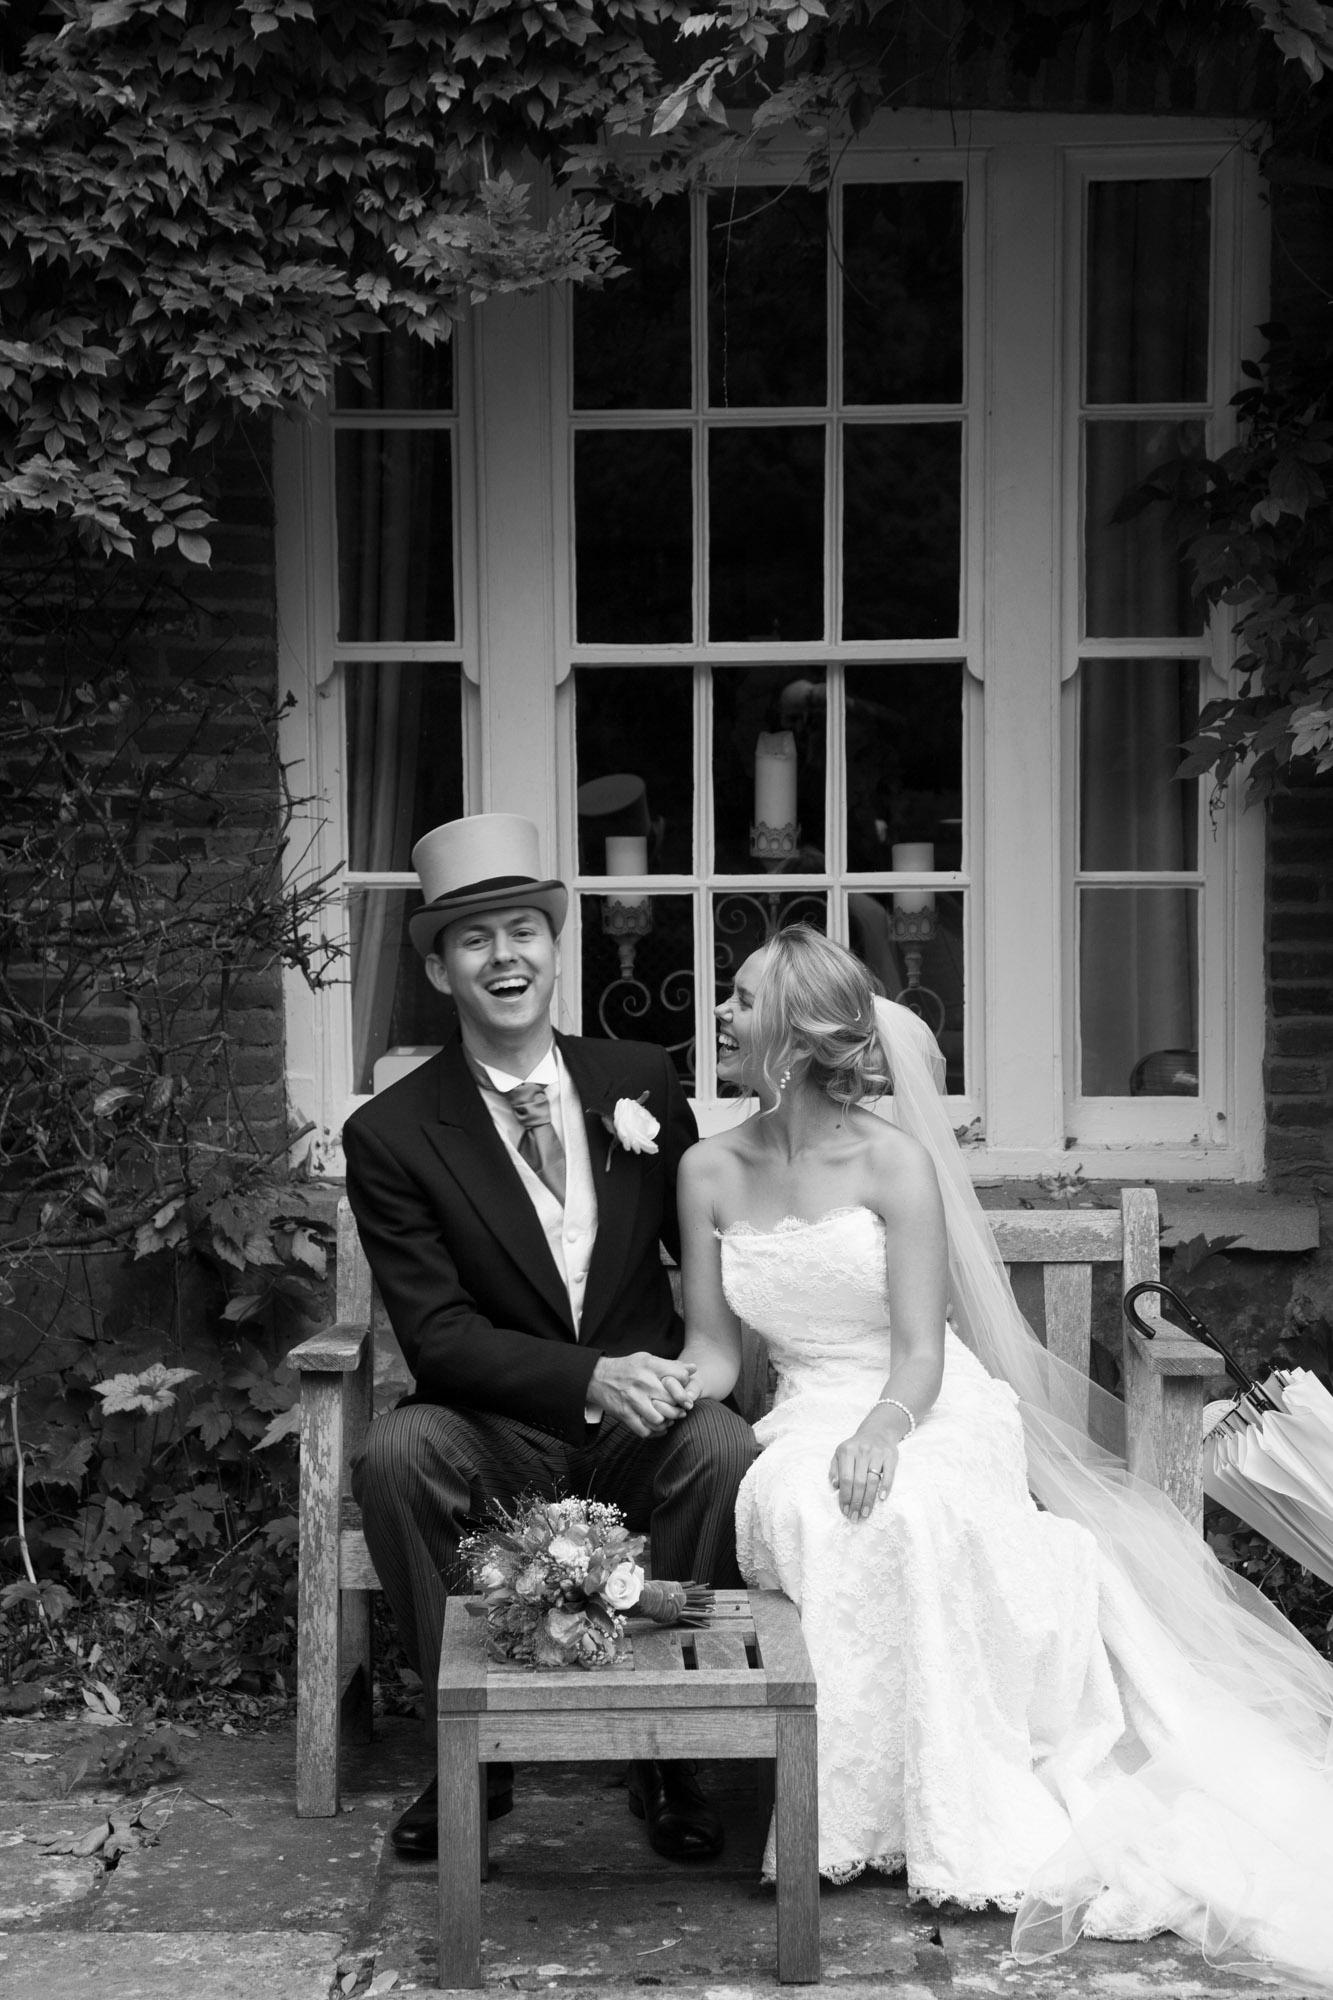 weddings-couples-love-photographer-oxford-london-jonathan-self-photography-81.jpg